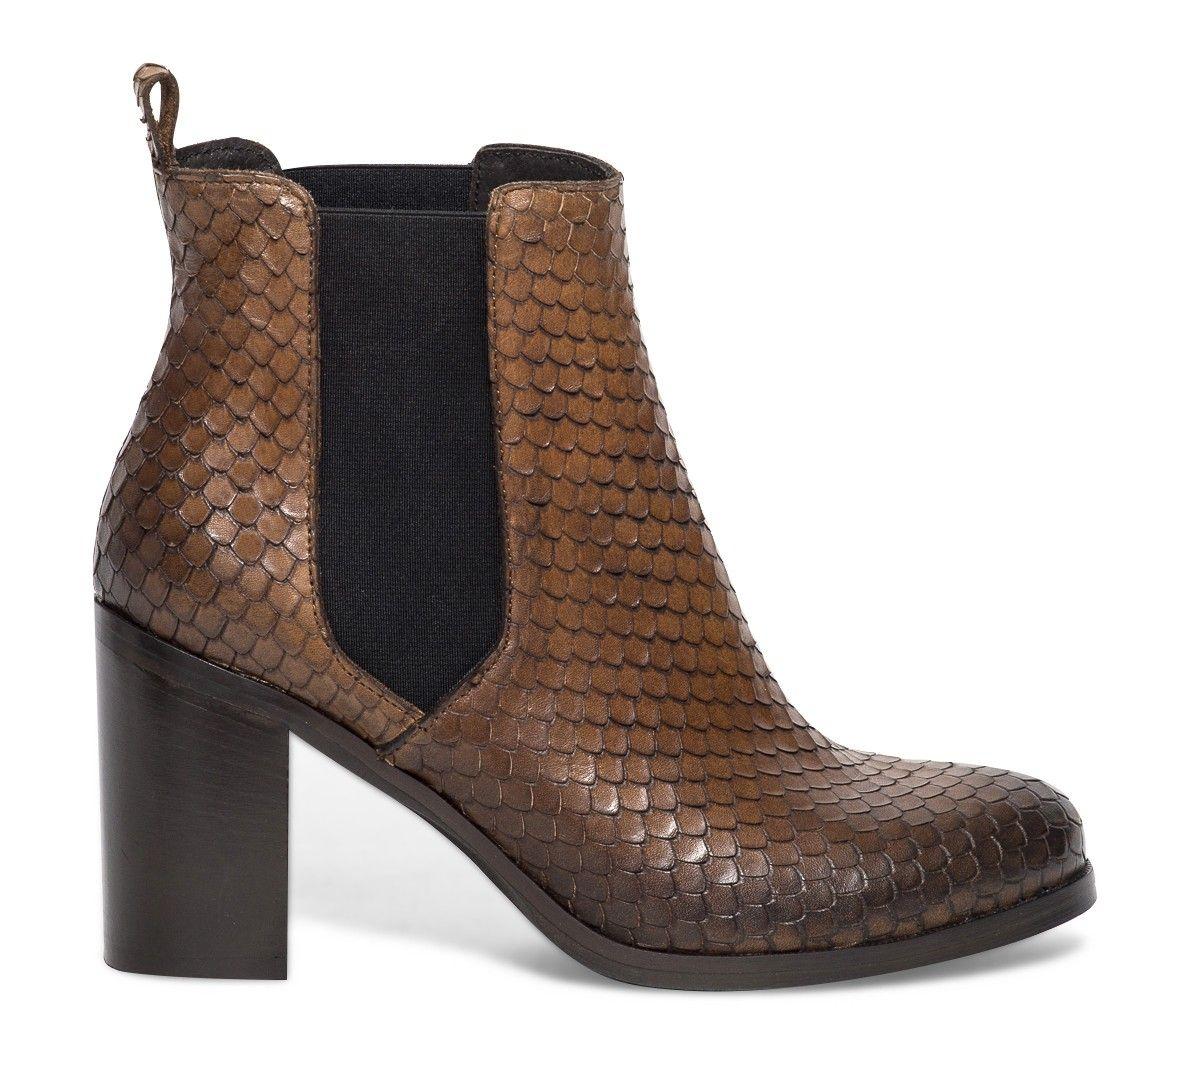 chelsea boots cuir écaille marron - boots / bottines - chaussures